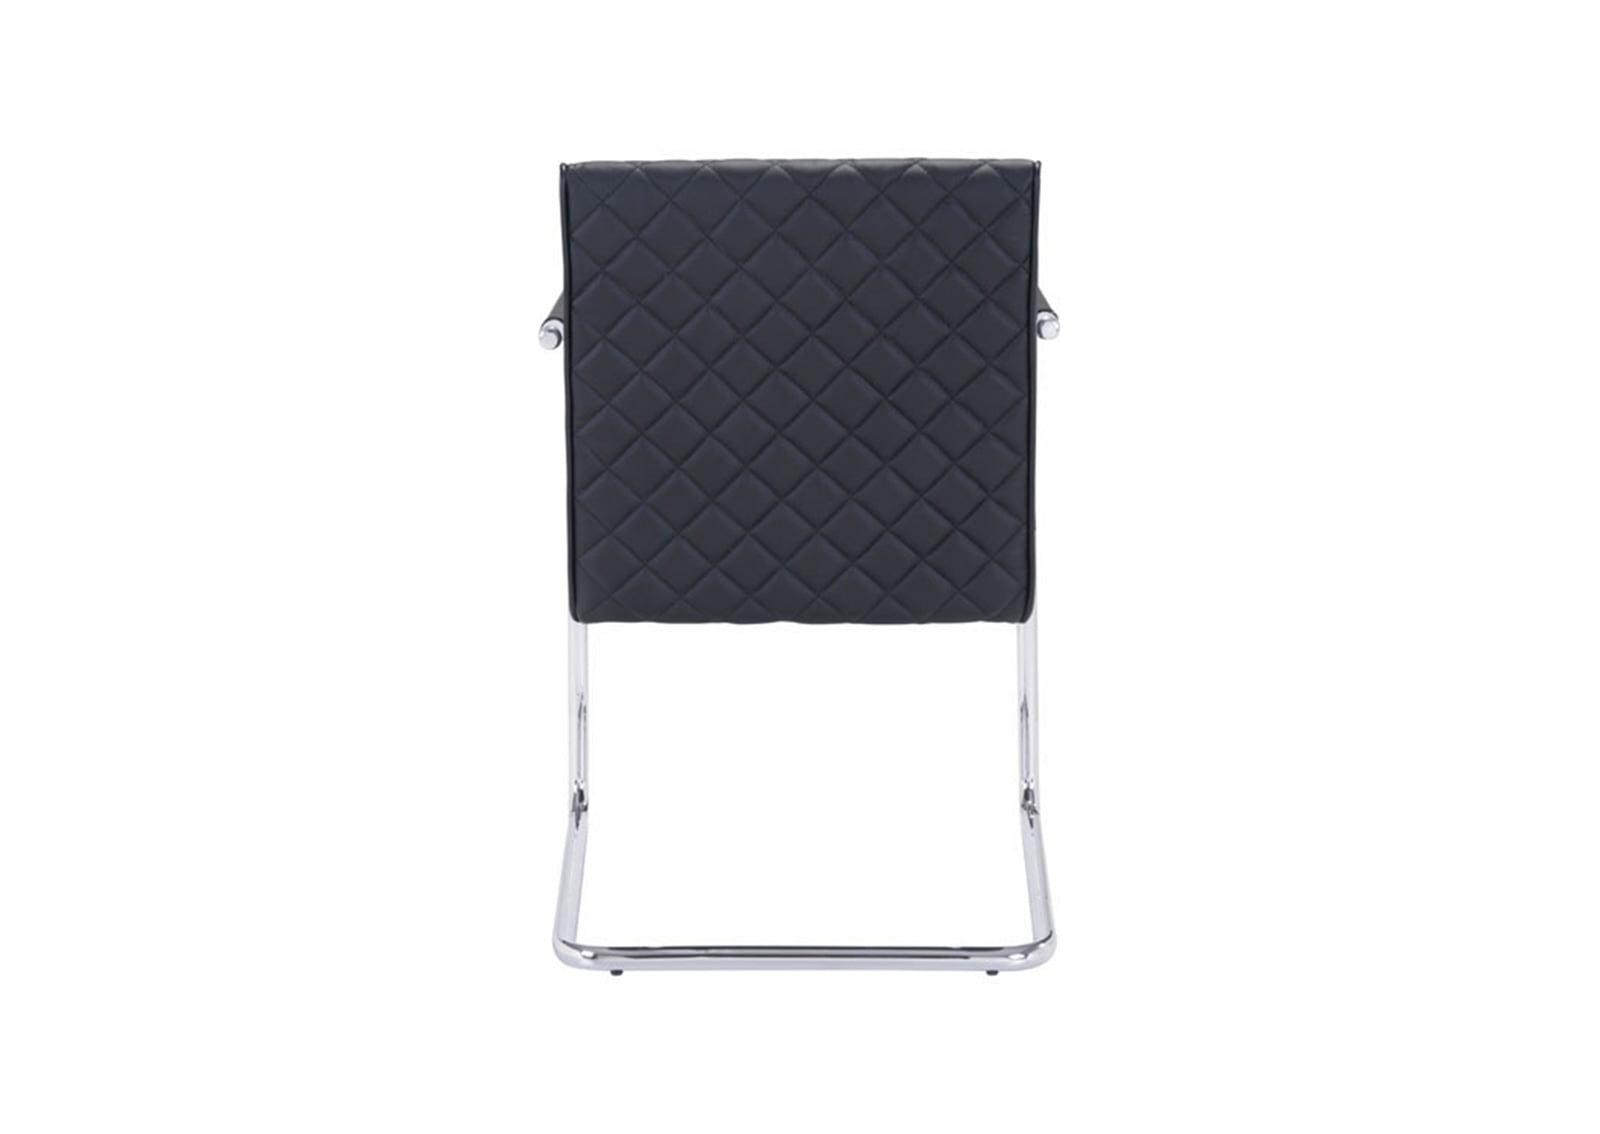 Quilt Dining Chair Black FurnishPlus : Quilt Dining Chair Black4 from furnishplus.ca size 1600 x 1134 jpeg 73kB